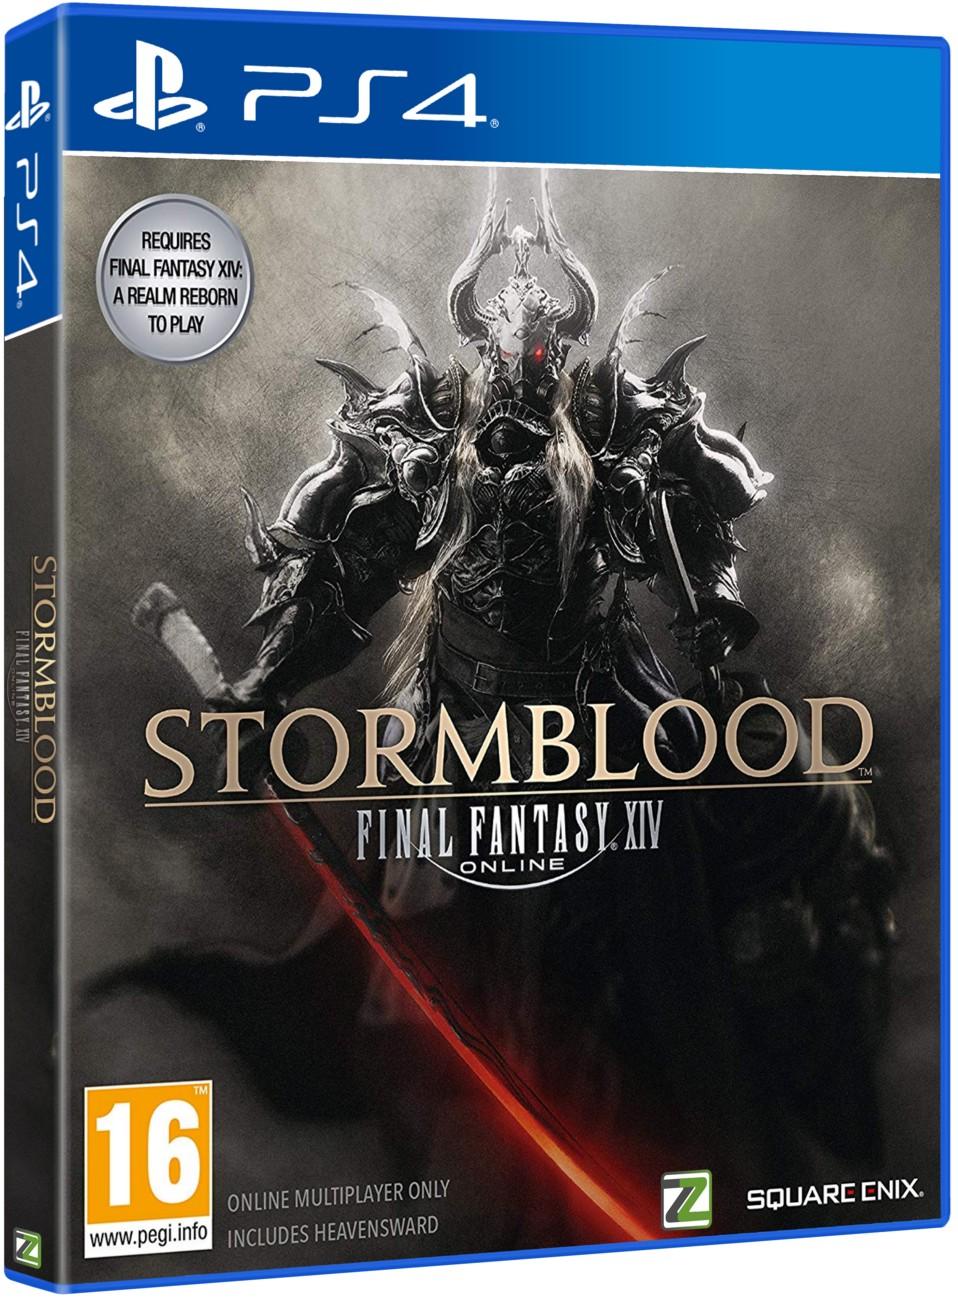 Final Fantasy XIV: StormBlood (Online) - PS4